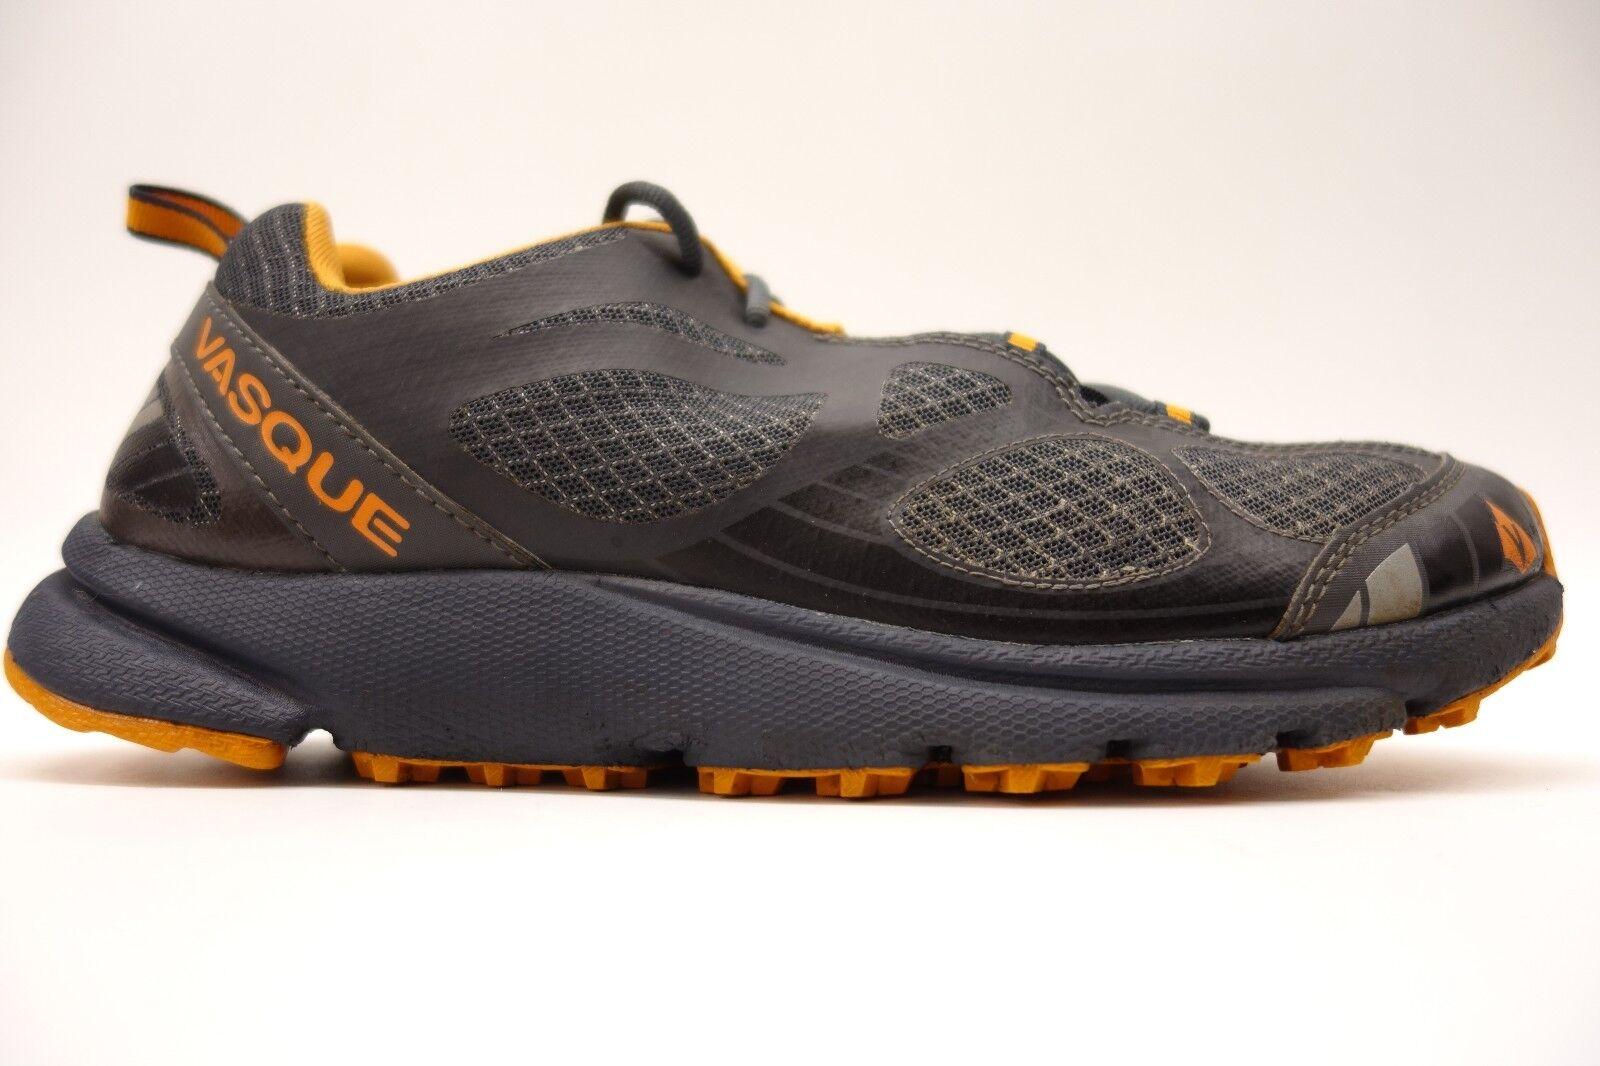 Vasque Uomo Uomo Uomo Constant Velocity Low Athletic Support Trail Hiking scarpe Dimensione 10 6913fa